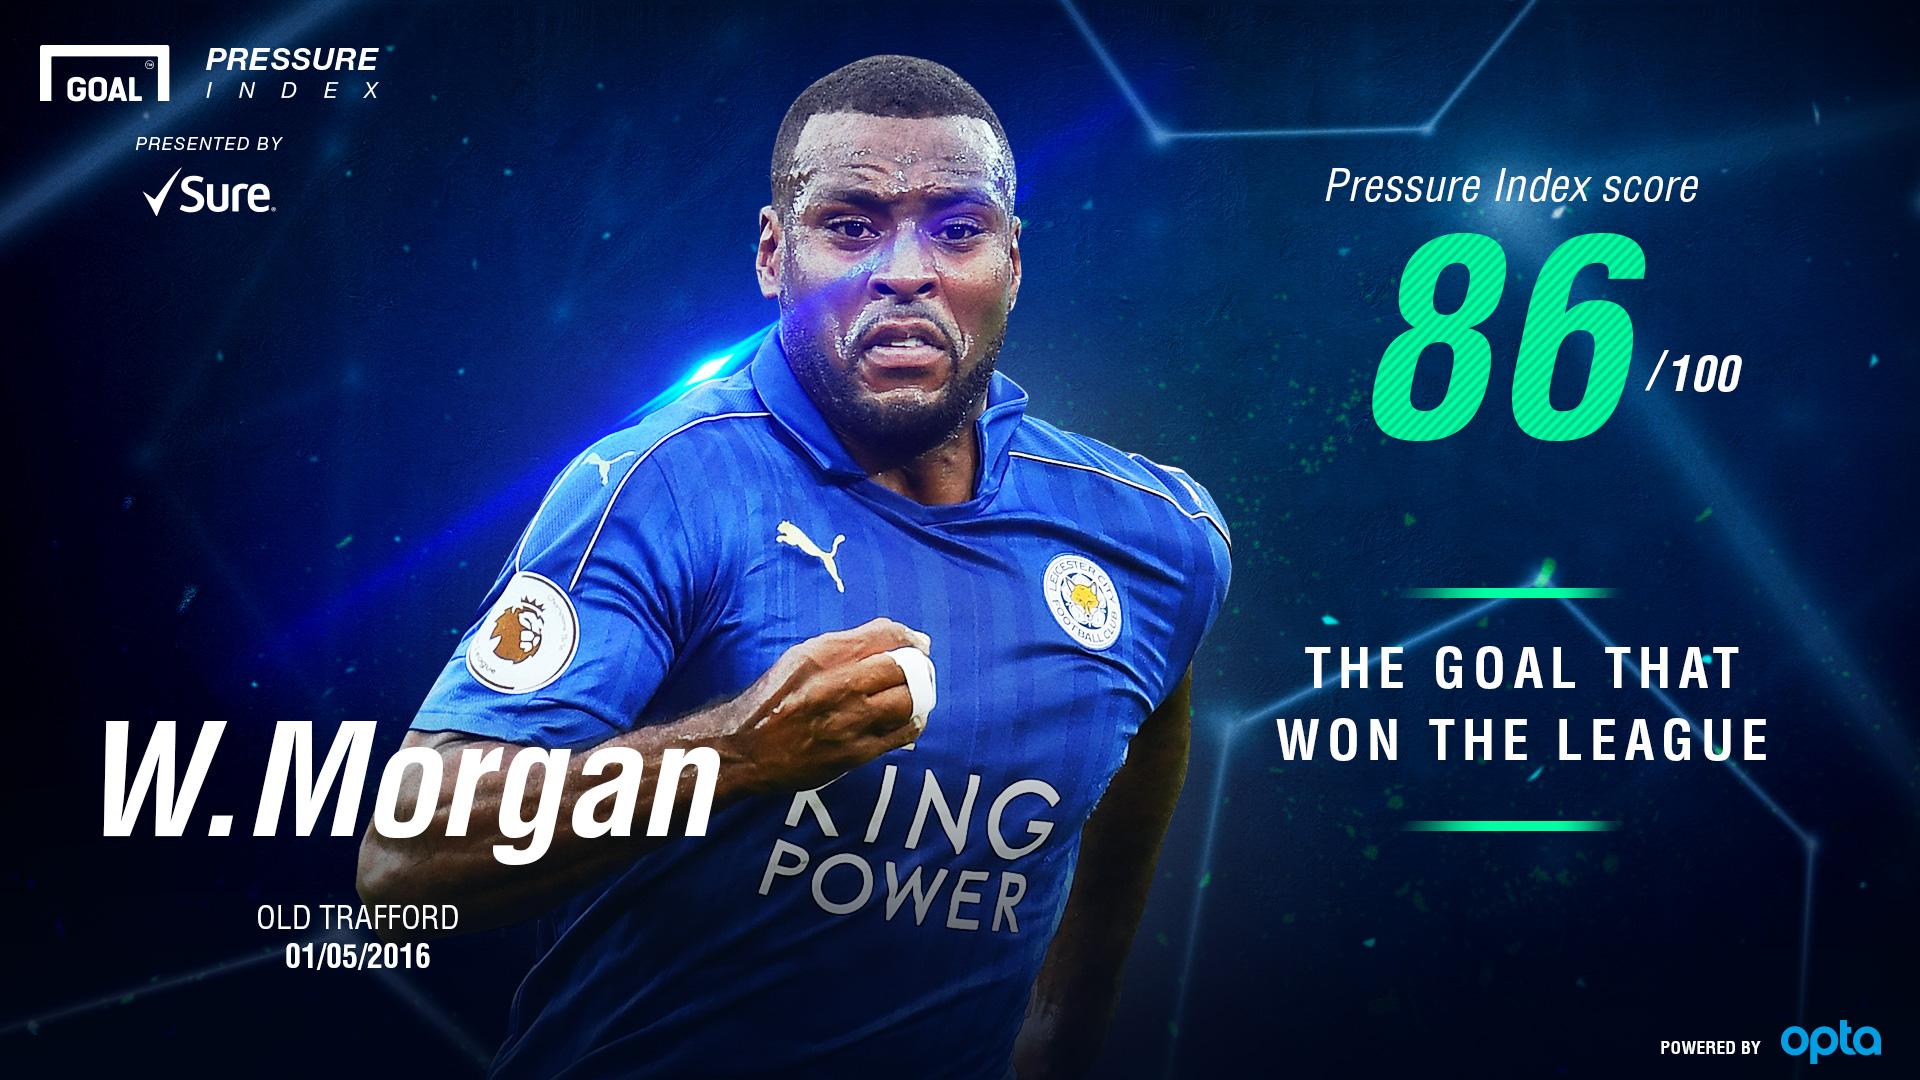 Wes Morgan Pressure Index